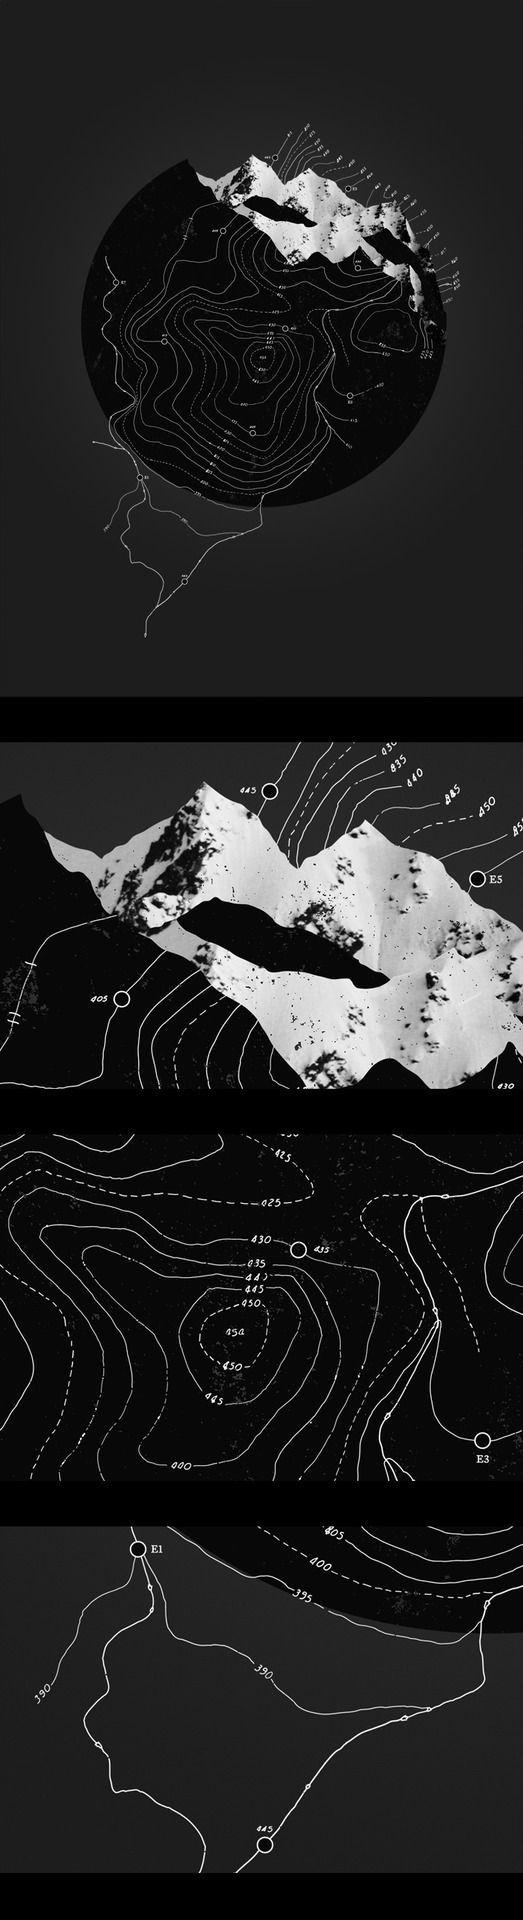 Mix of flat   3d. Topgrafo. Land Surveyor. Repin: Topografa BGO Navarro - Estudio de Ingeniera #infographics